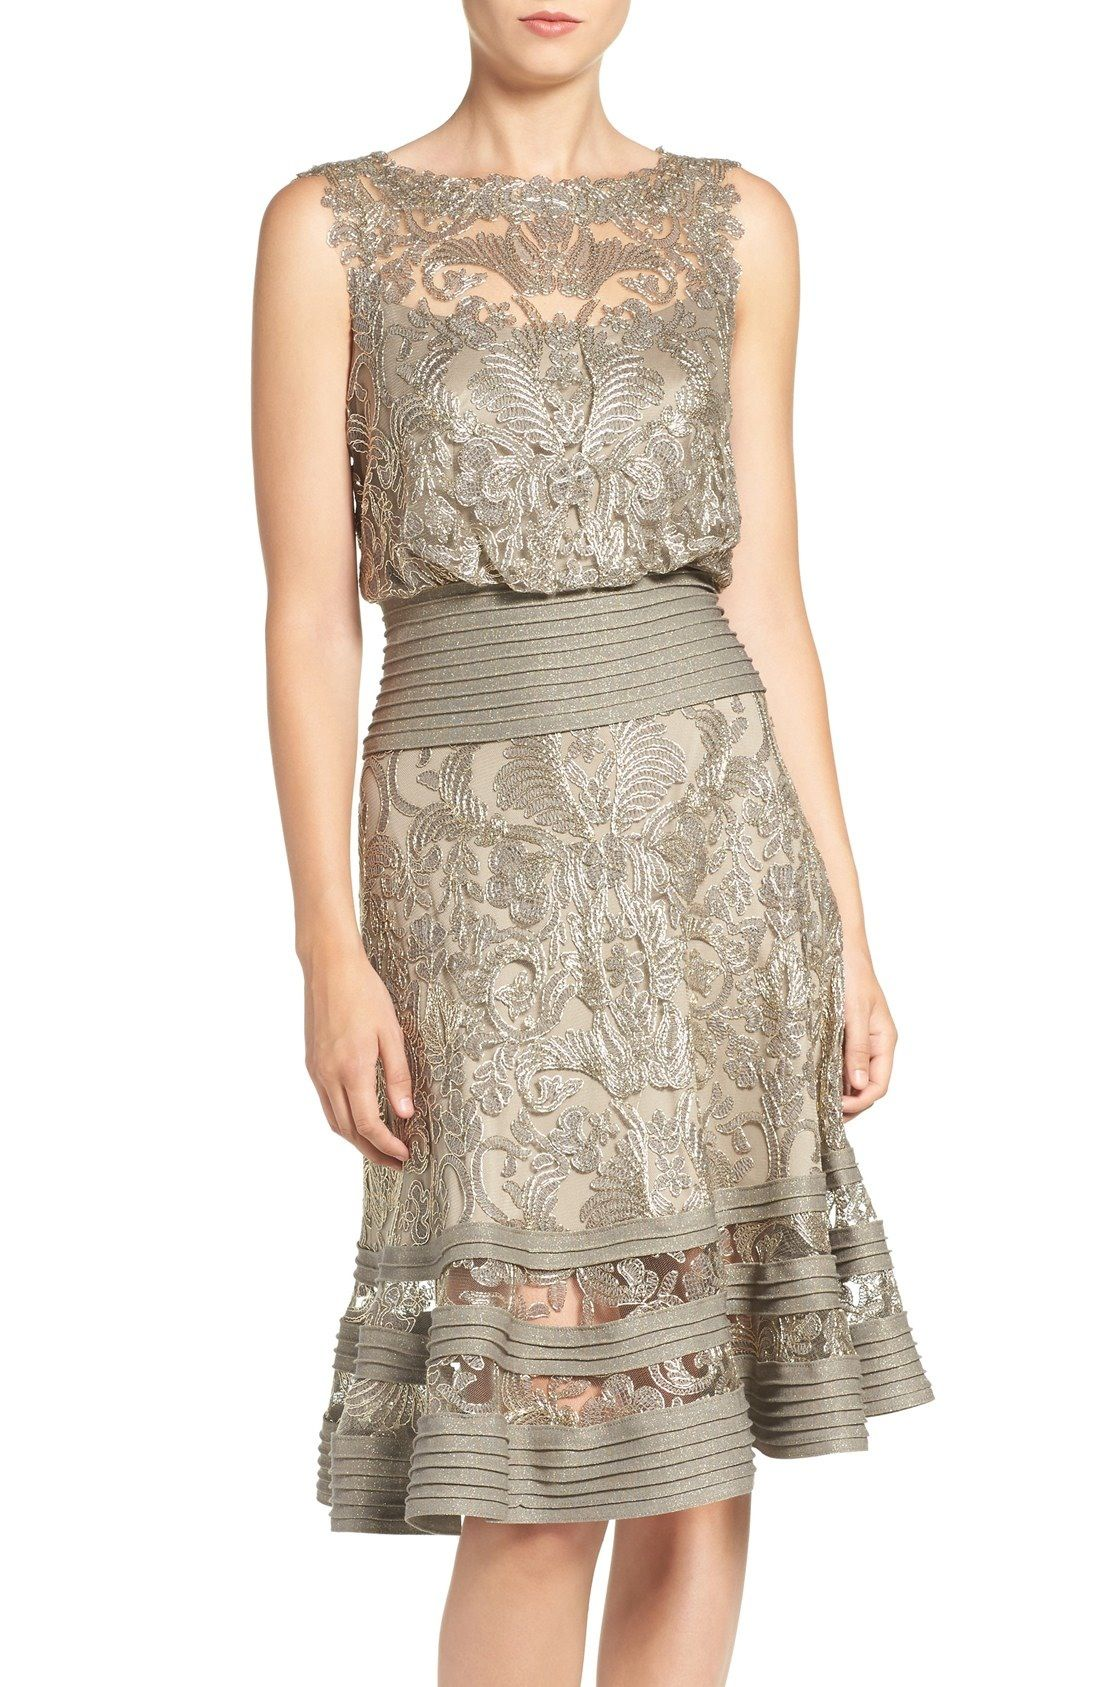 Tadashi Shoji Mixed Media Blouson Dress available at #Nordstrom ...